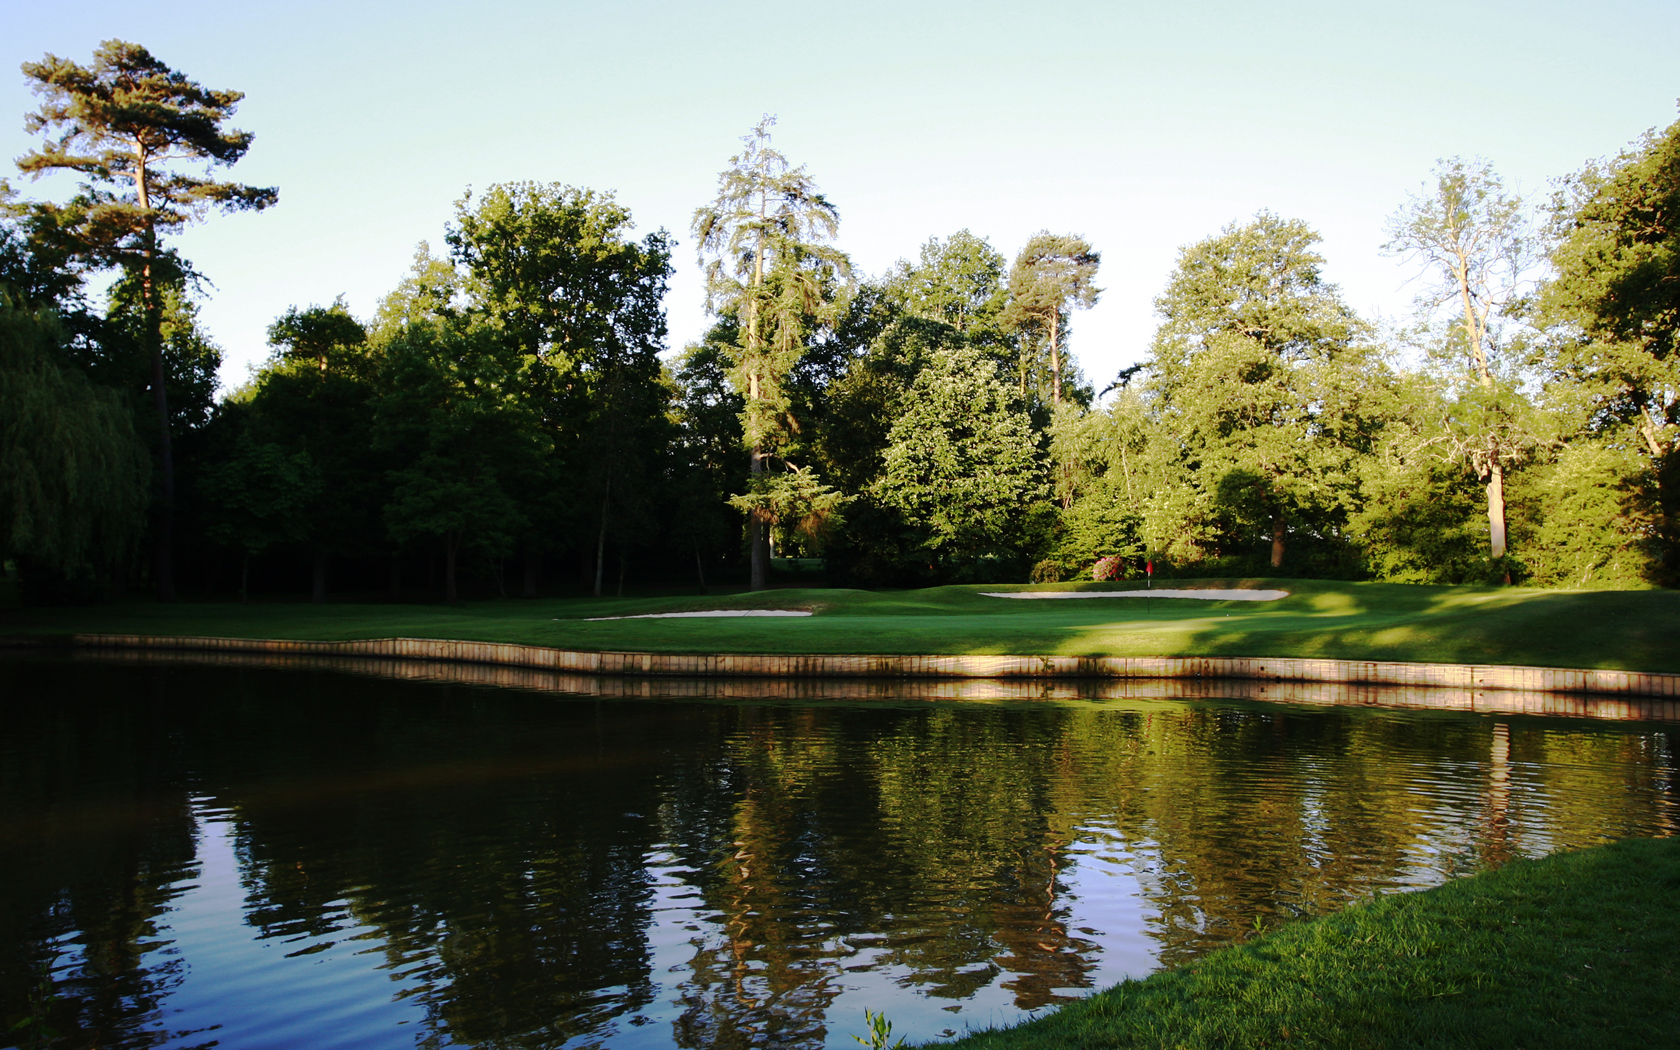 Free Golf Wallpaper And Screensavers